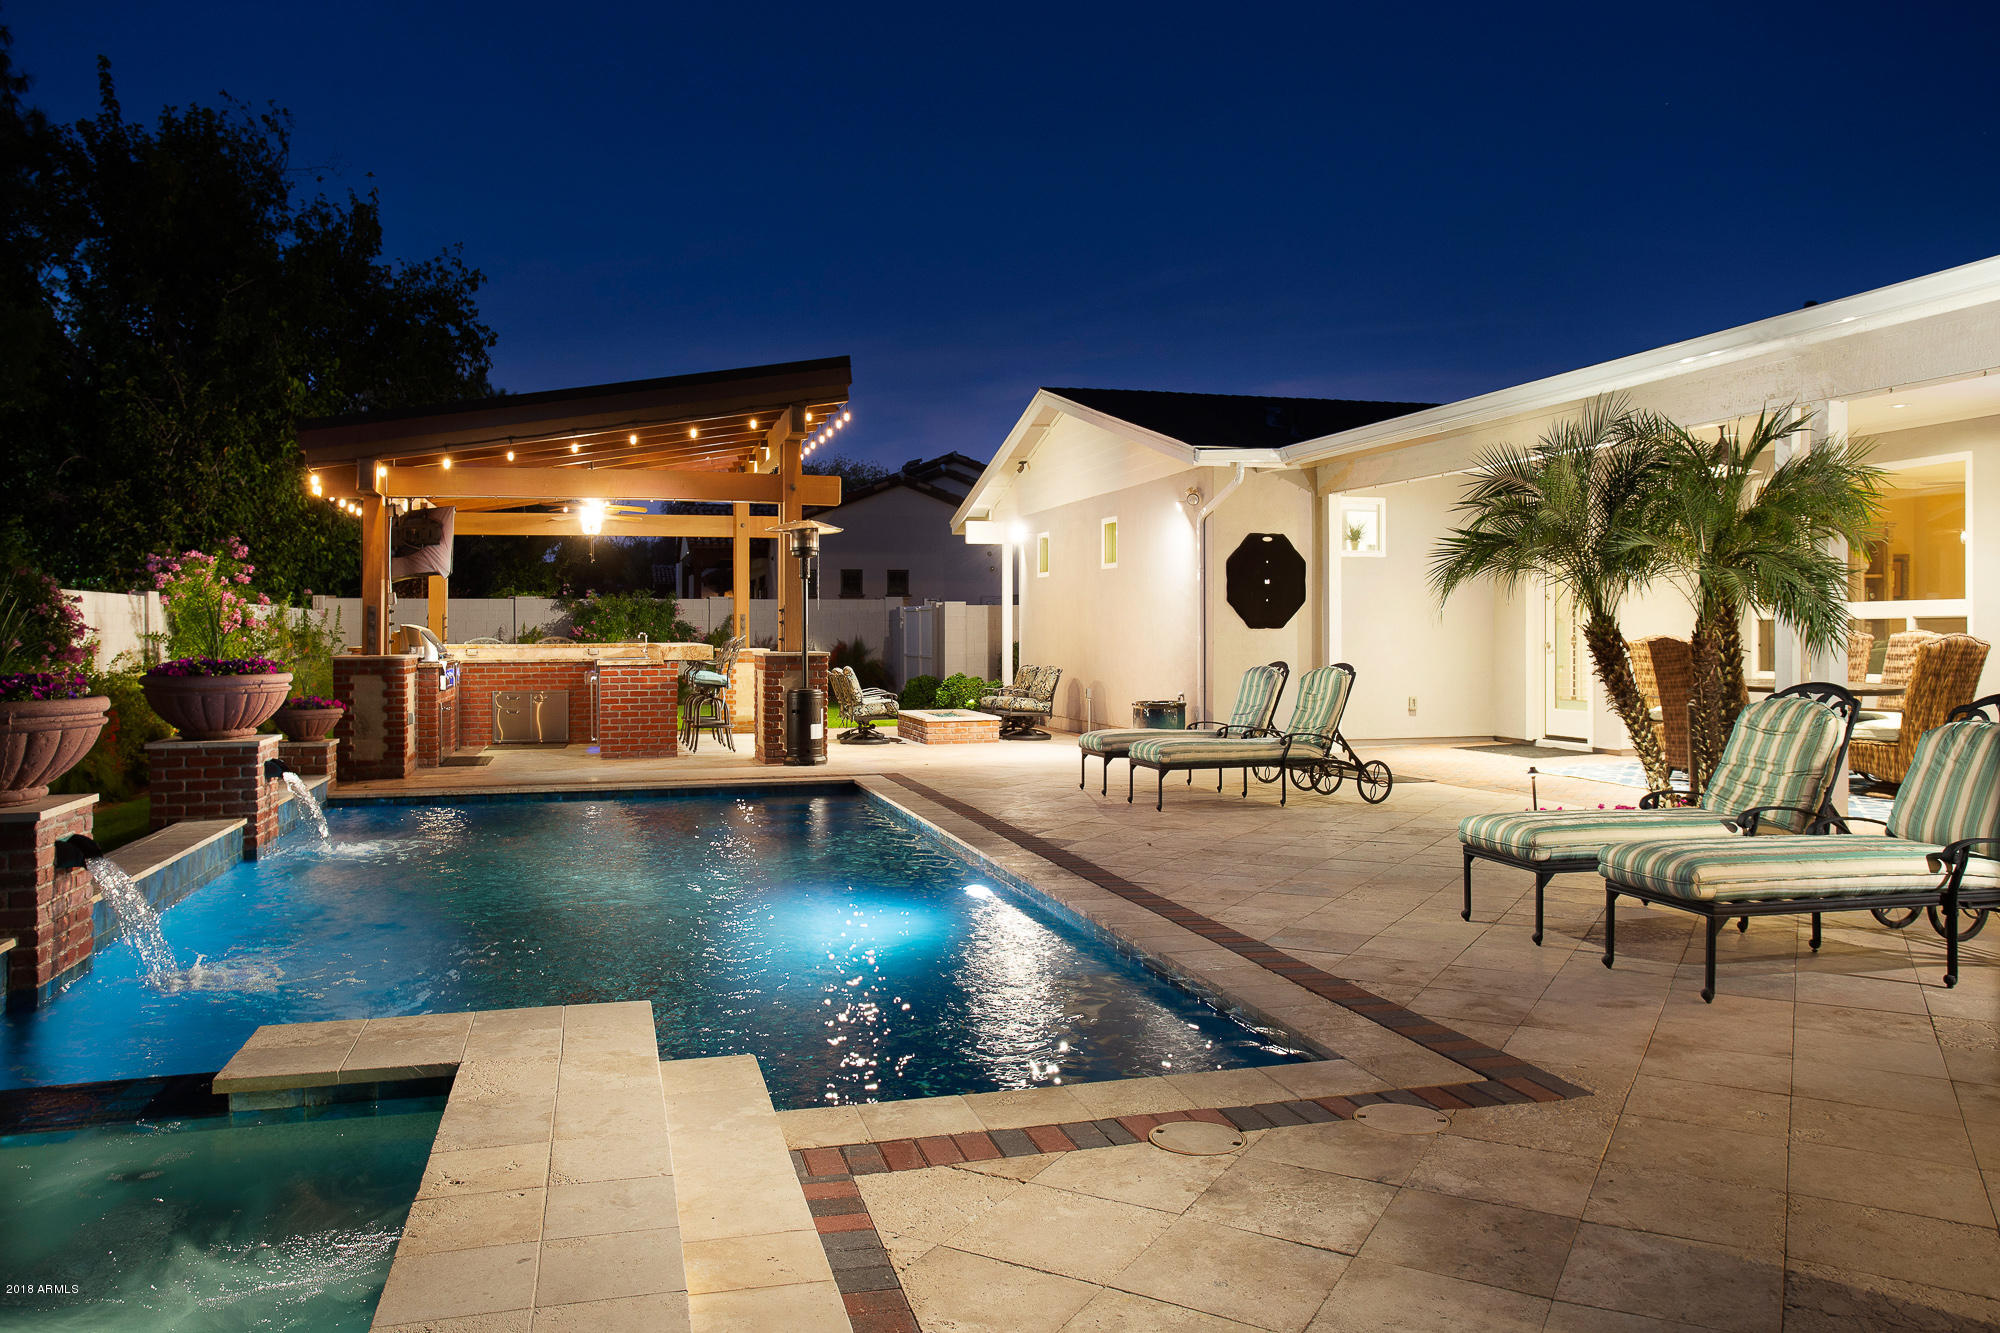 MLS 5840704 5510 N 4th Street, Phoenix, AZ 85012 Phoenix AZ Condo or Townhome